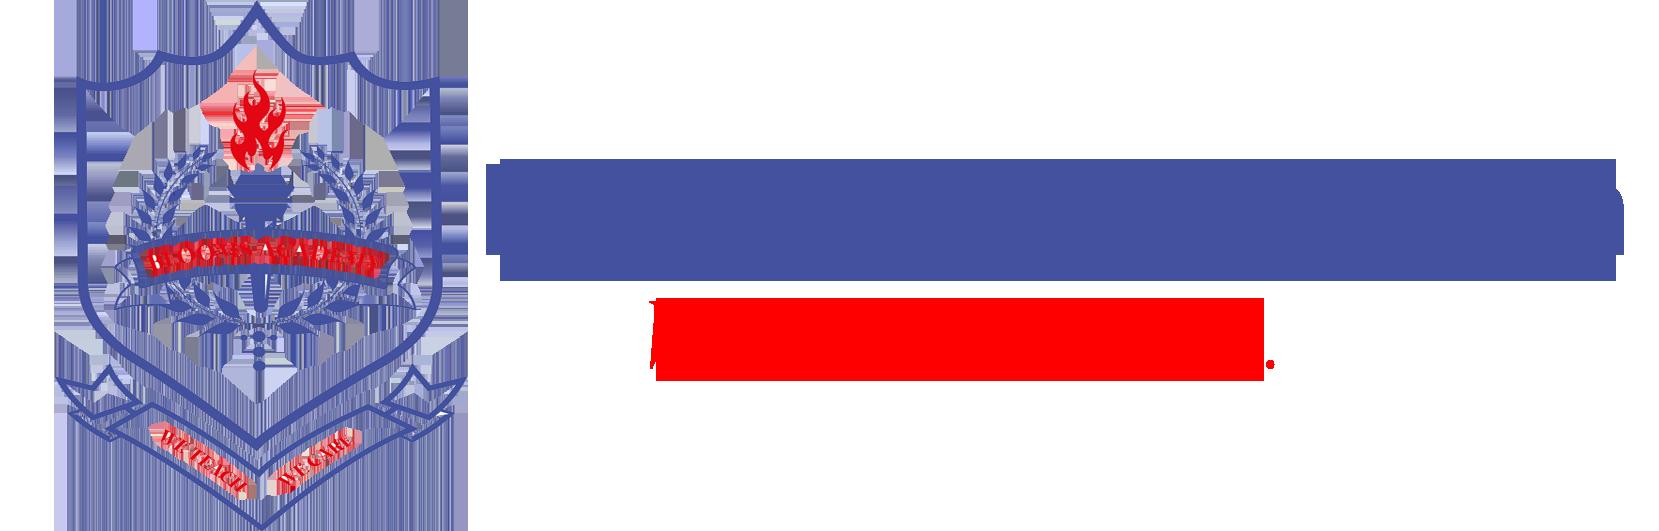 .::Blooms Academy, Abuja